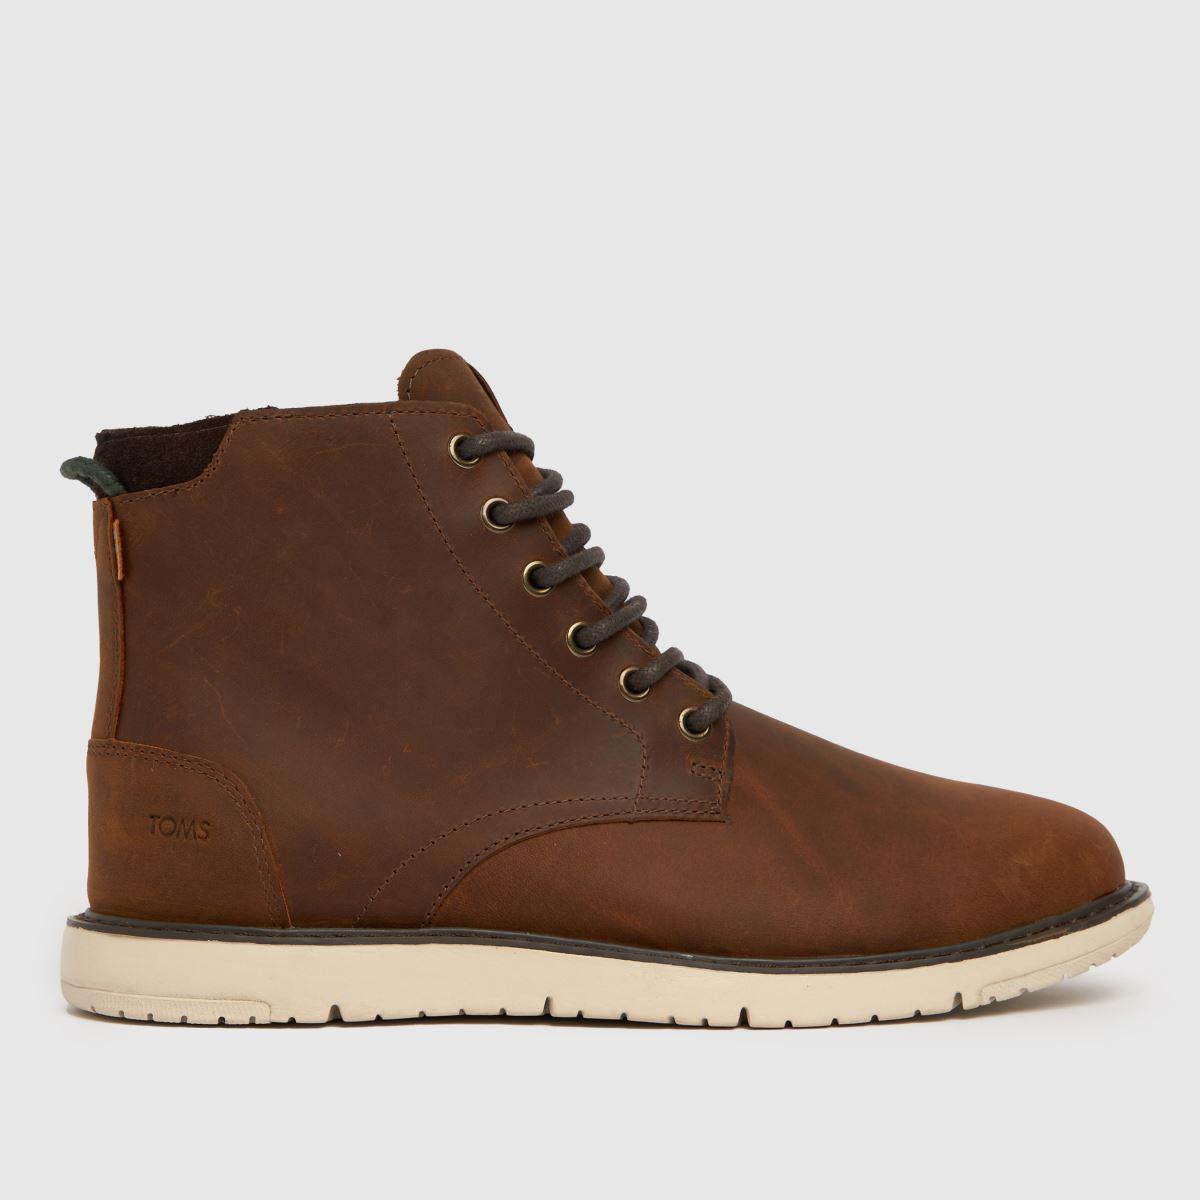 TOMS Brown Hillside Boots